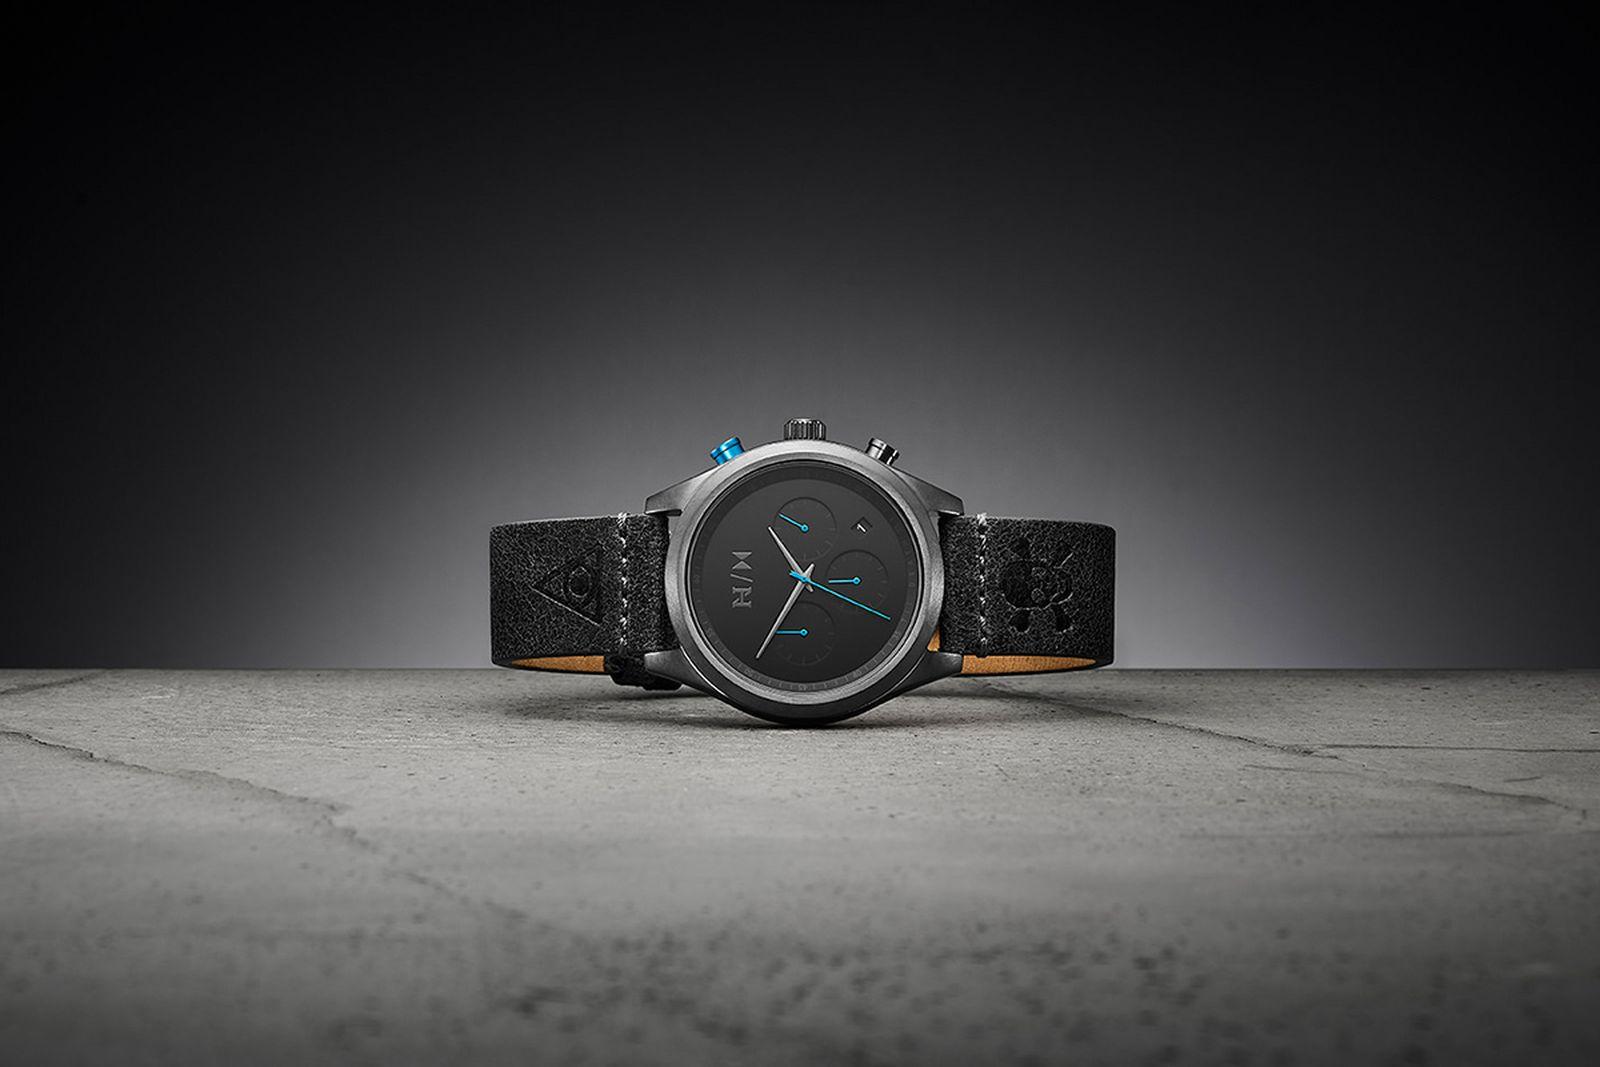 mvmt-nyjah-huston-watch-01